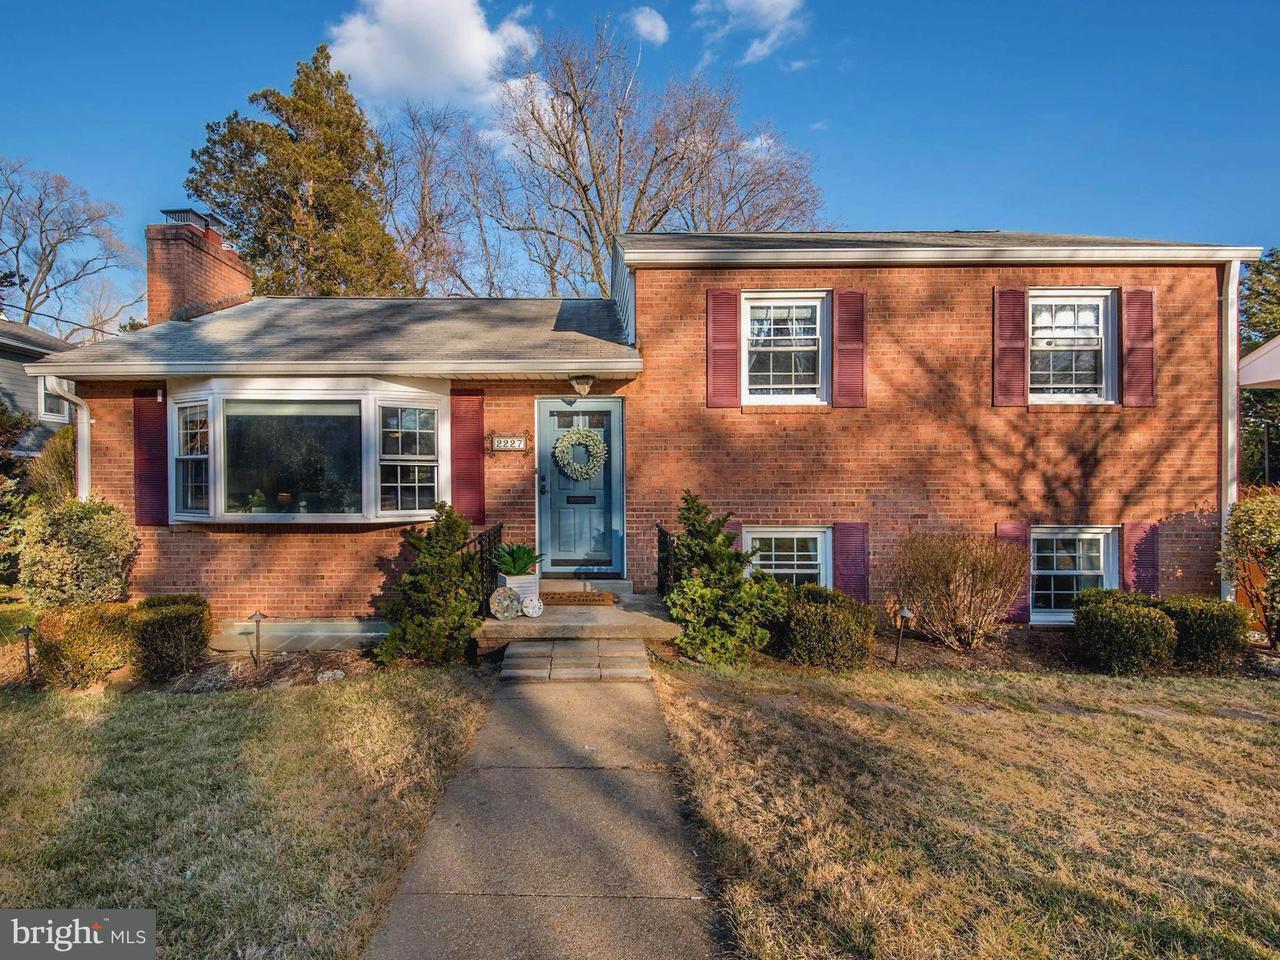 Single Family Home for Sale at 2227 Powhatan St N 2227 Powhatan St N Arlington, Virginia 22205 United States